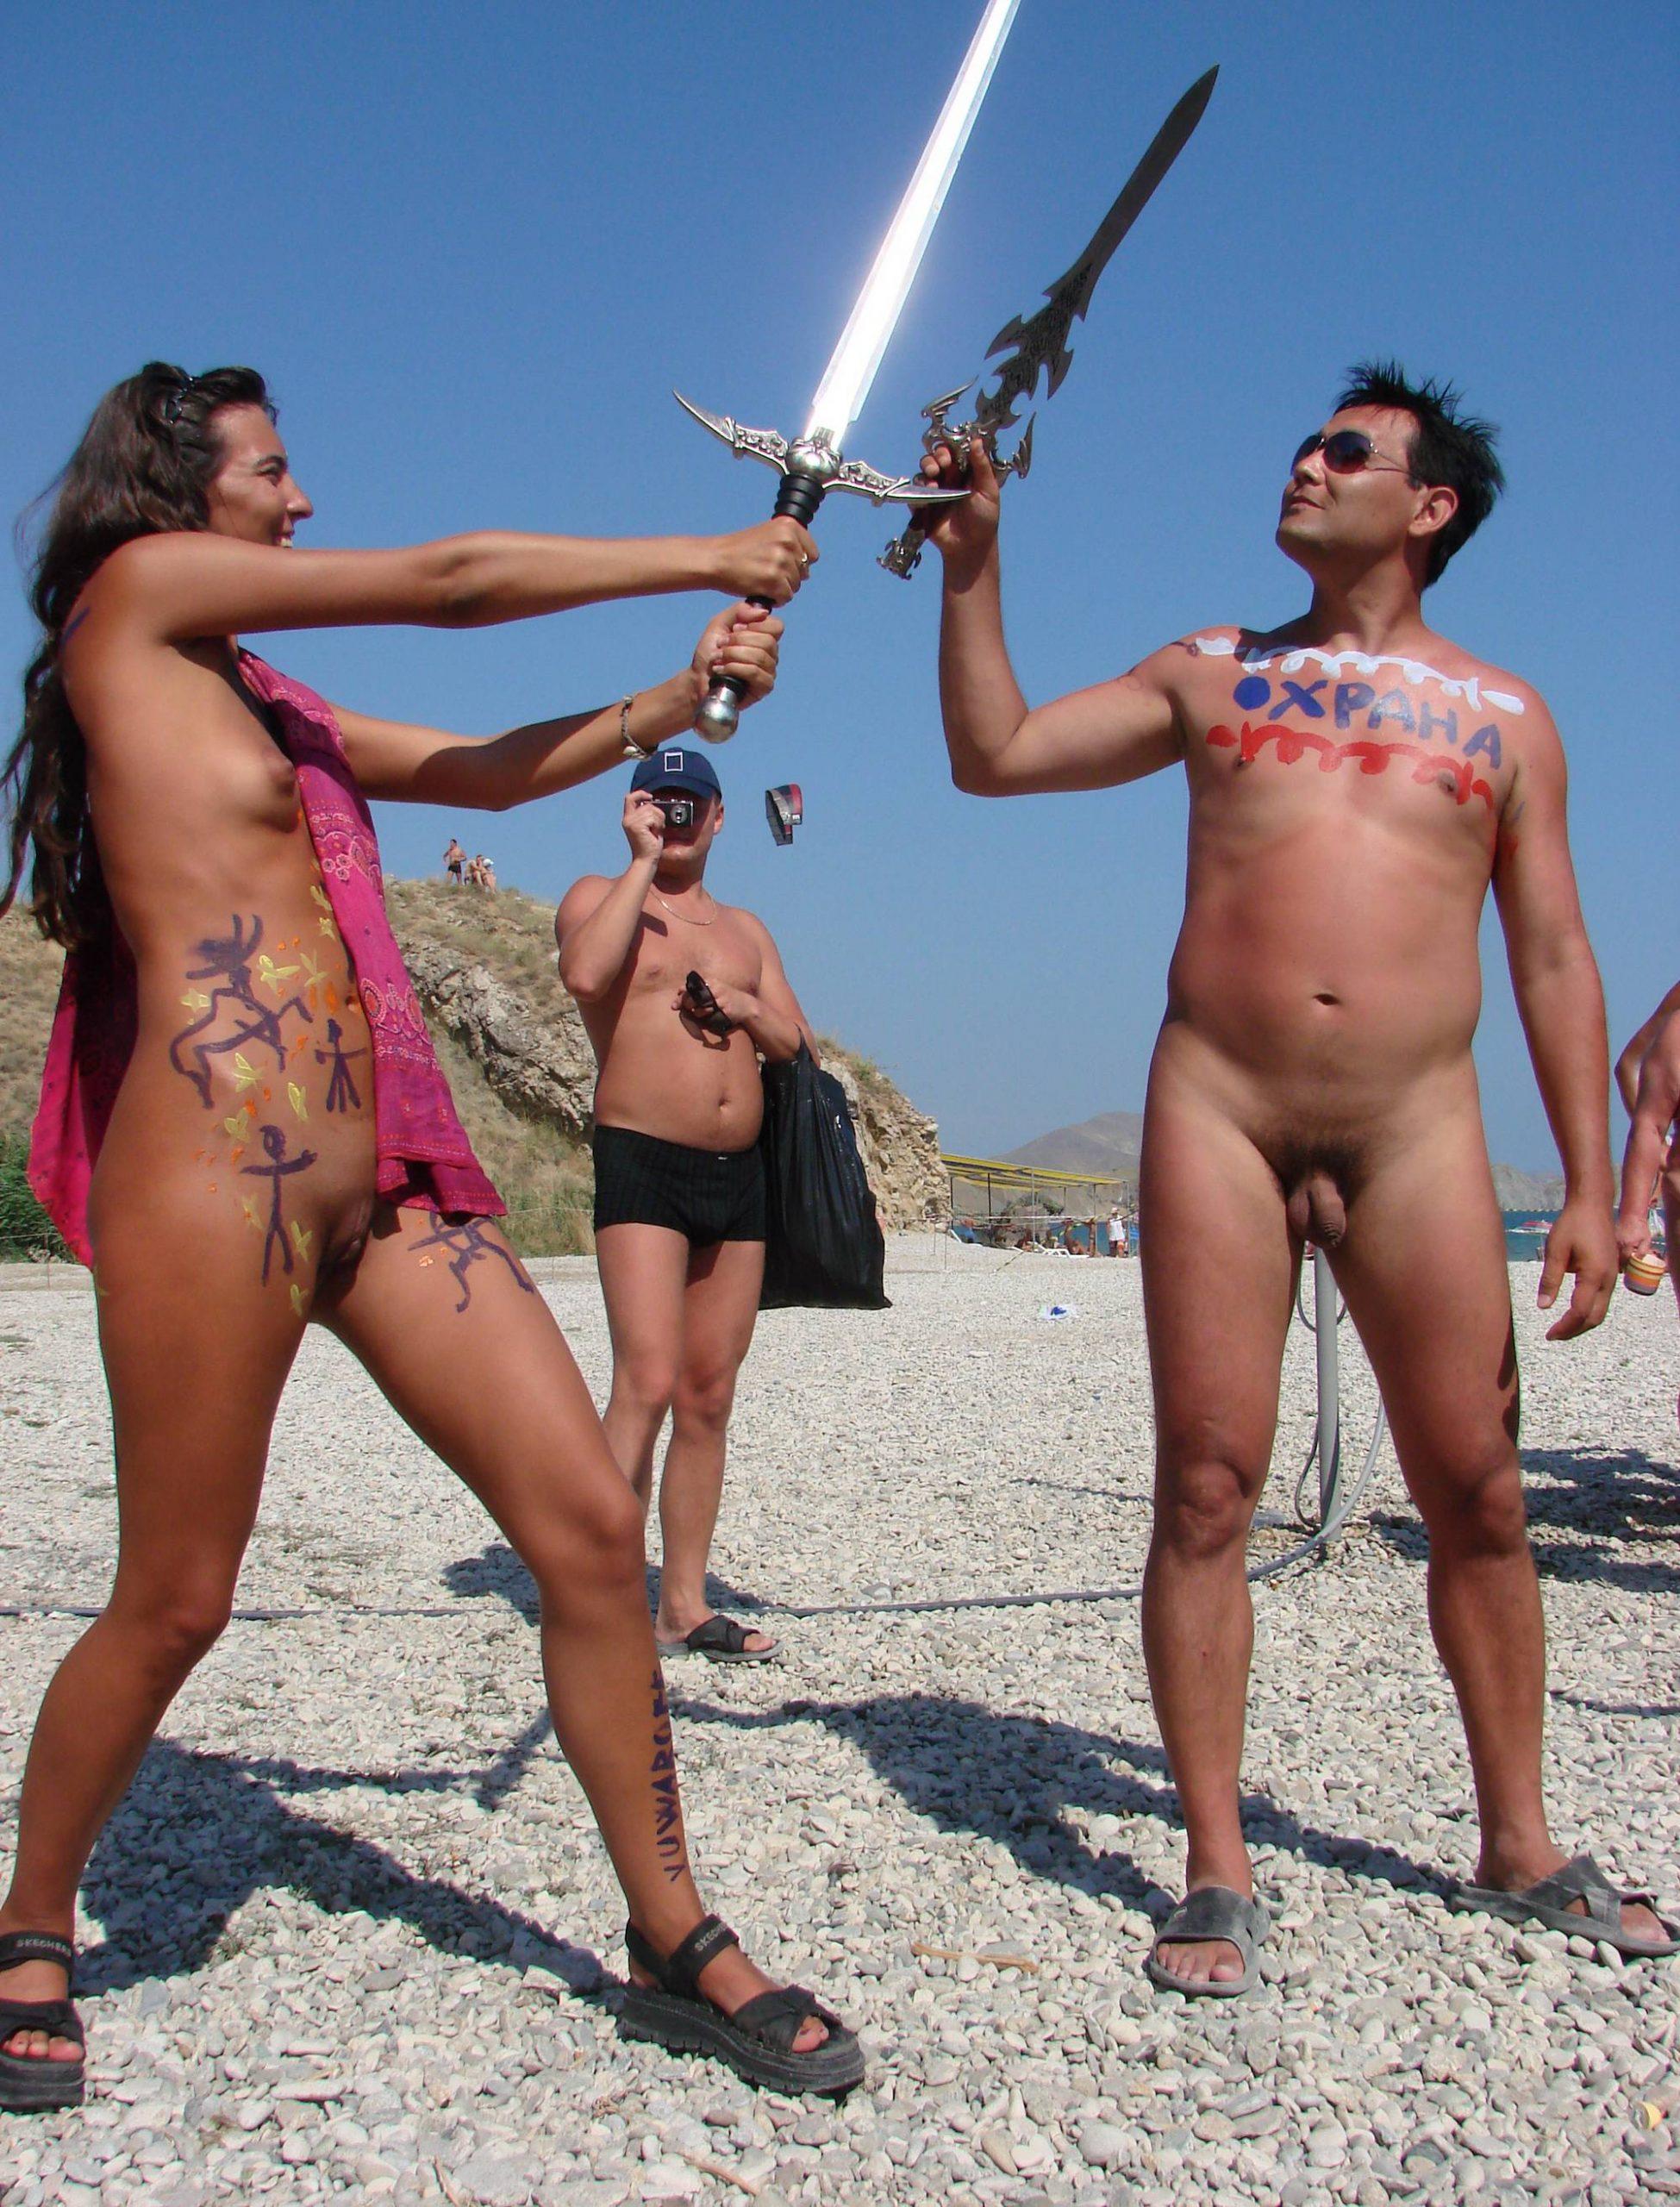 Neptune Day Sword Fights - 1